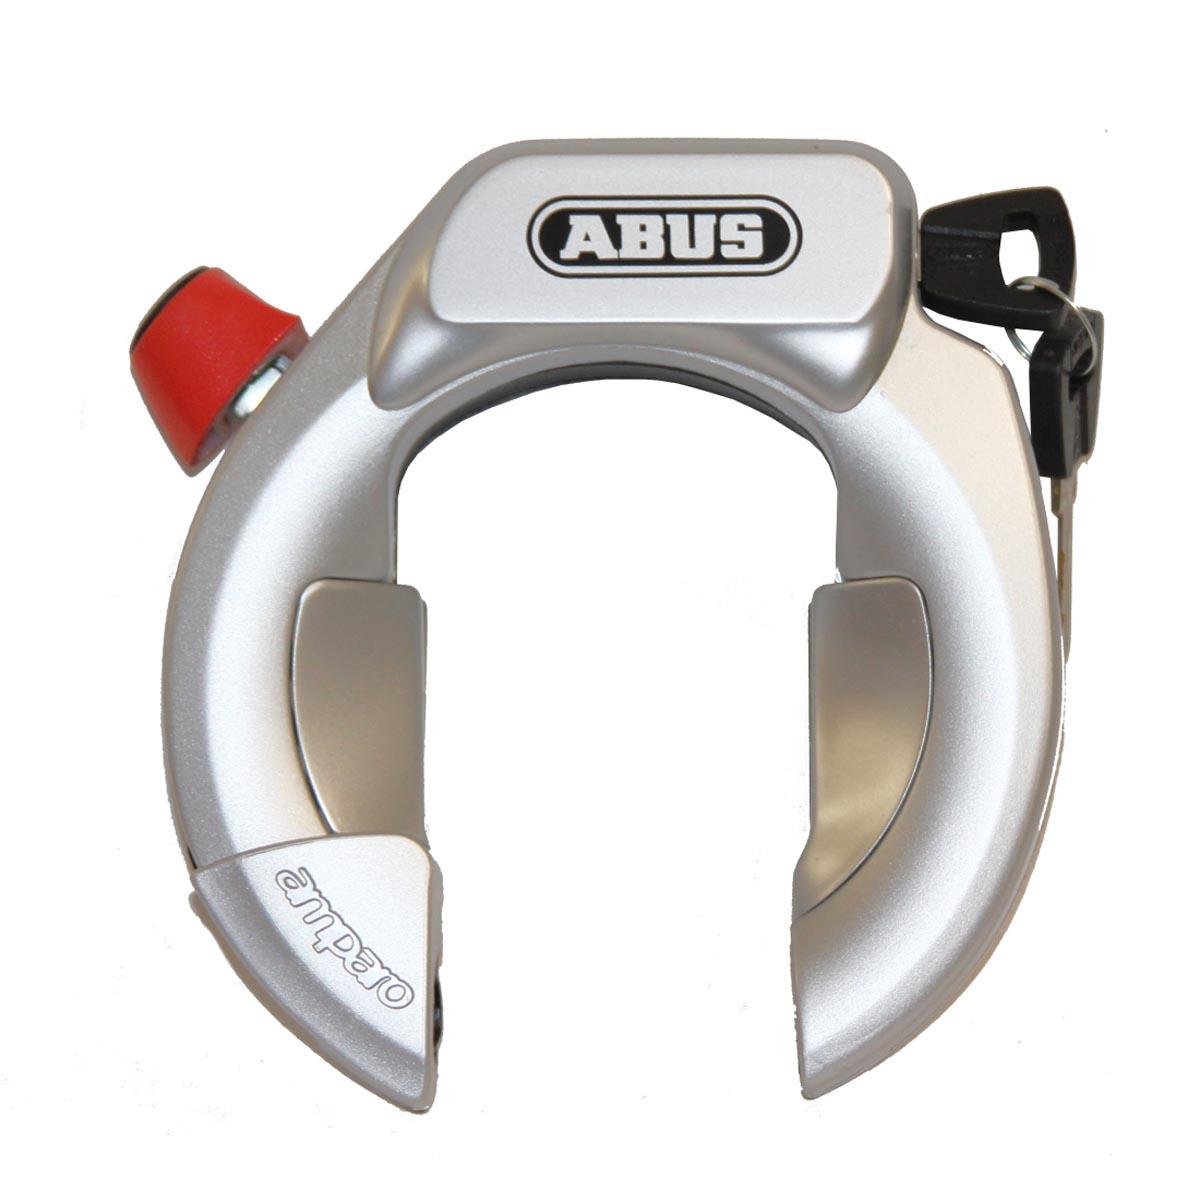 abus amparo 4850 lh kr bicycle frame lock level 9 white black silver ebay. Black Bedroom Furniture Sets. Home Design Ideas